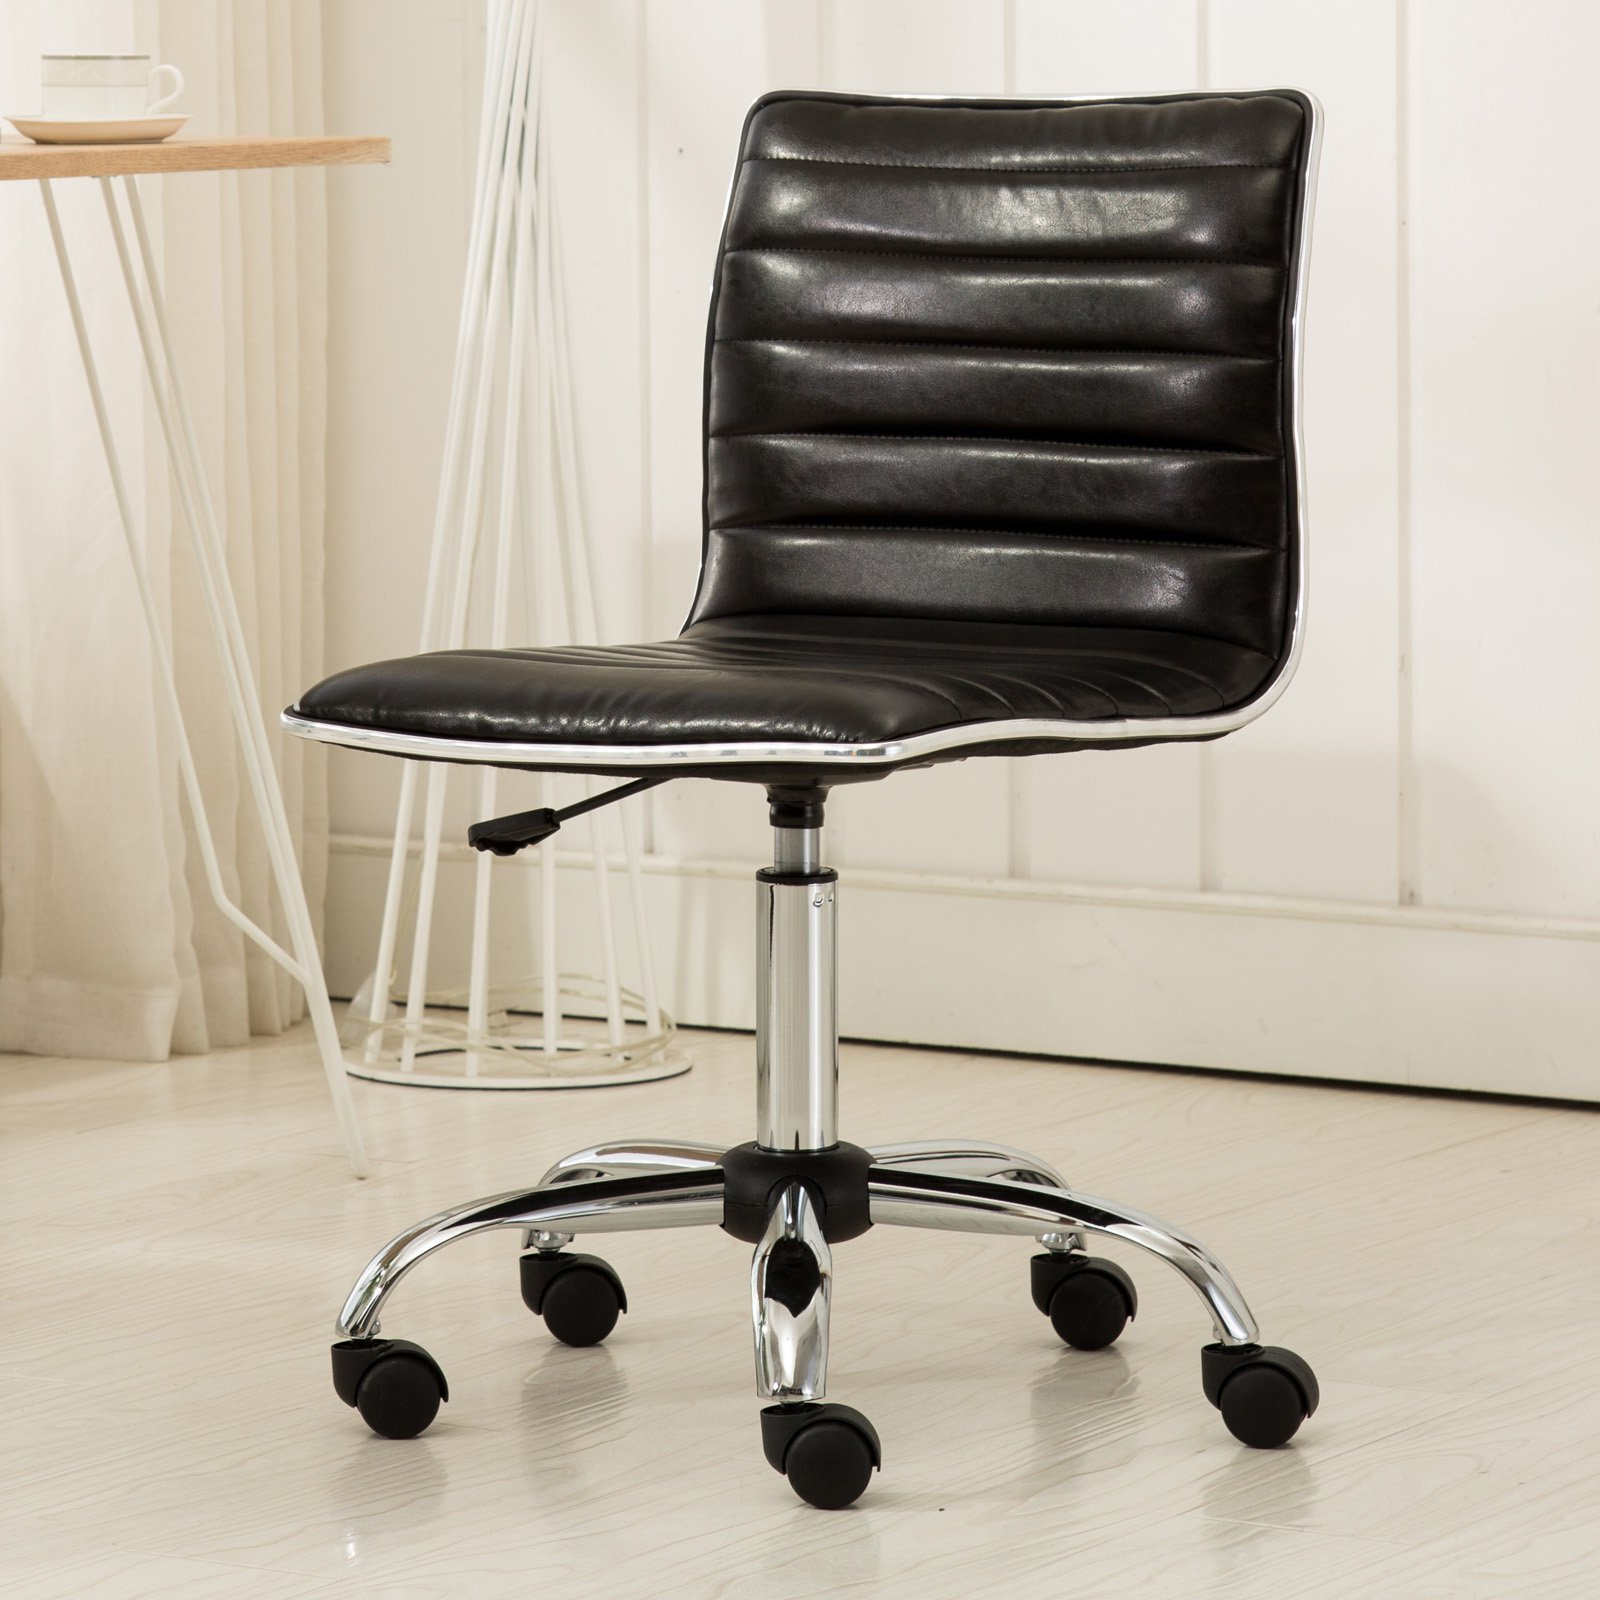 Roundhill Furniture Fremo Chromel Adjustable Air Lift Office Chair, Black